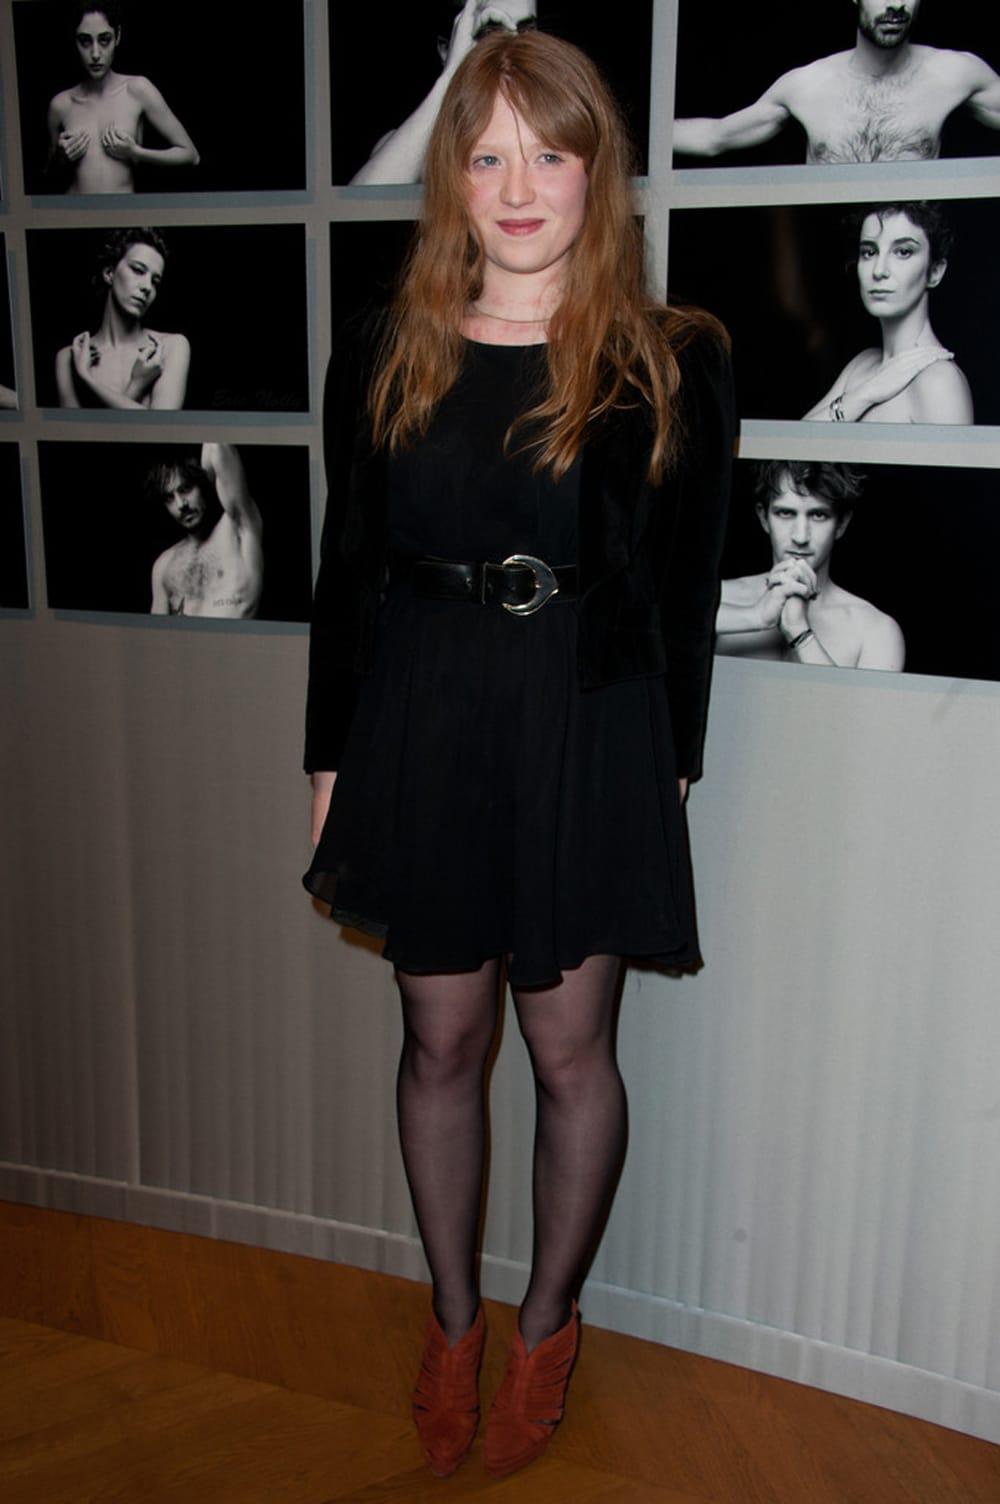 Iliana Zabeth